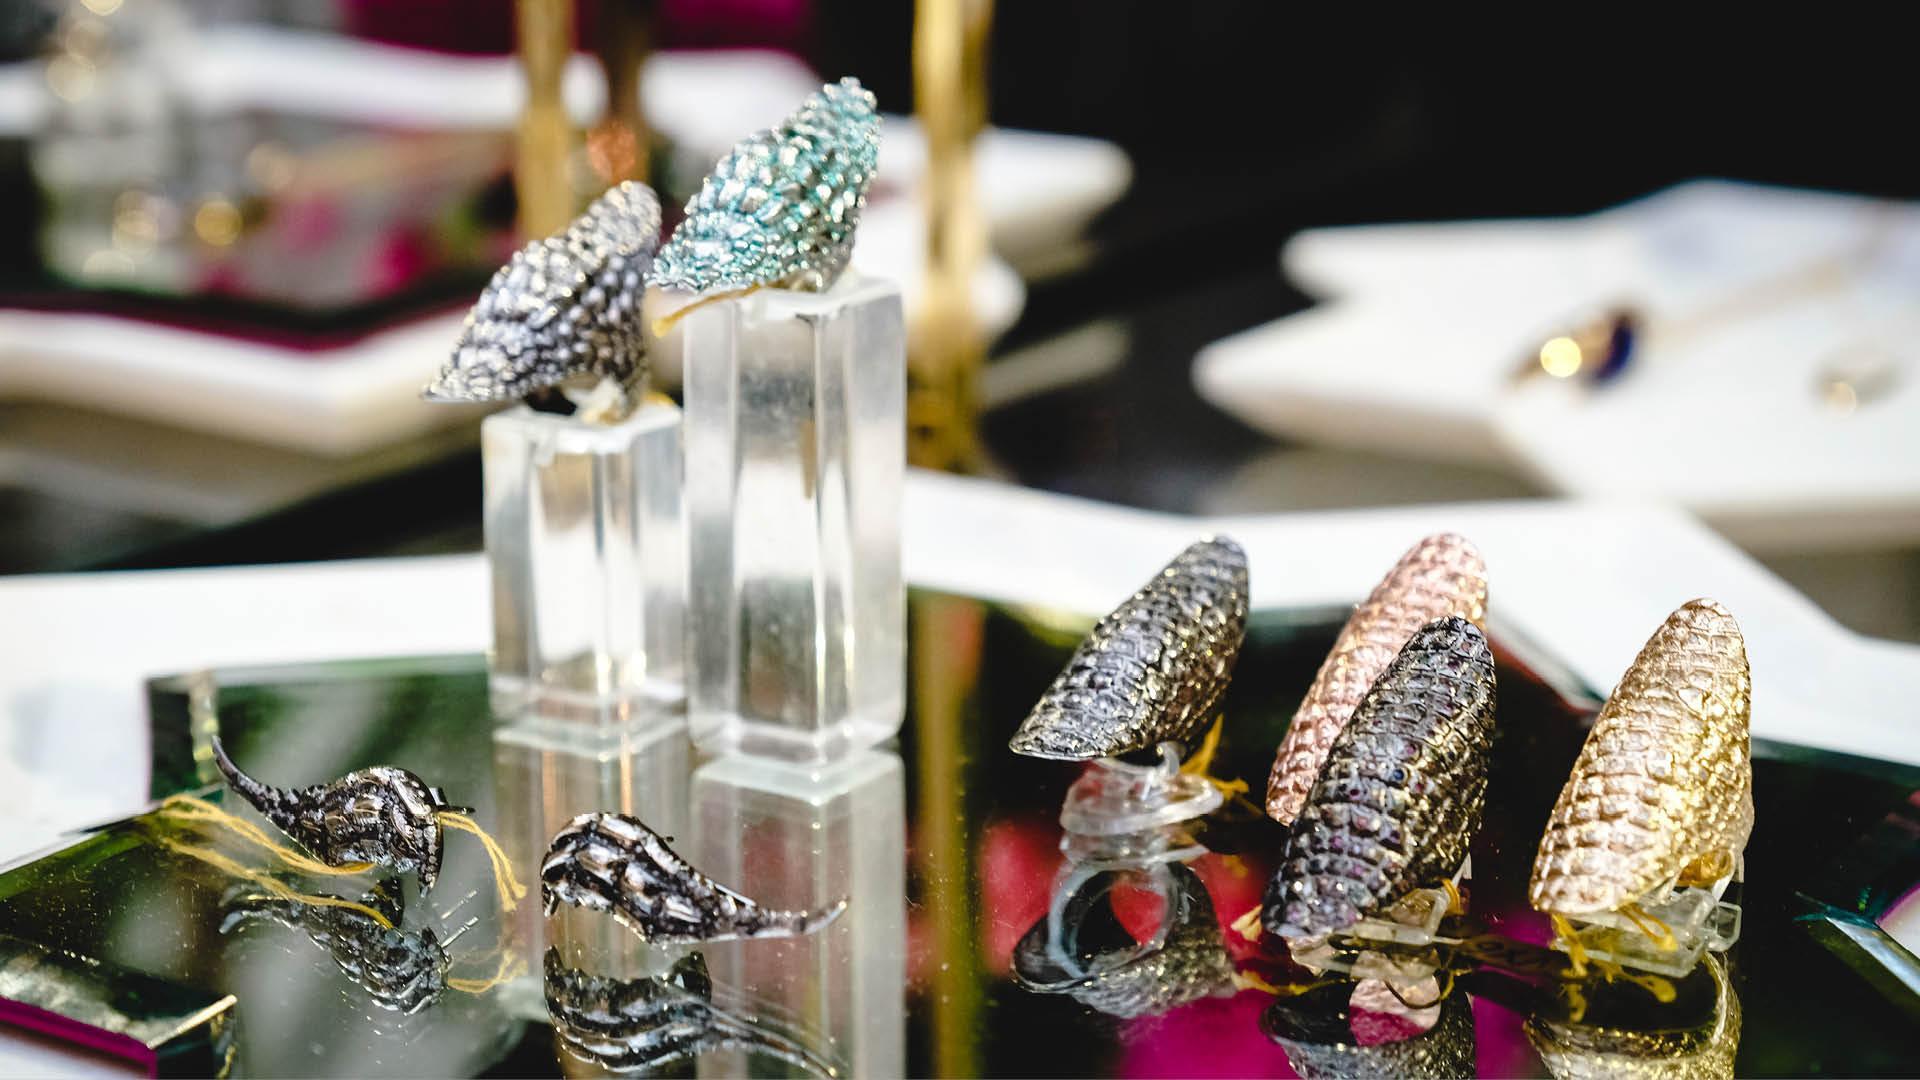 Venyx jewellery rings at Aubade